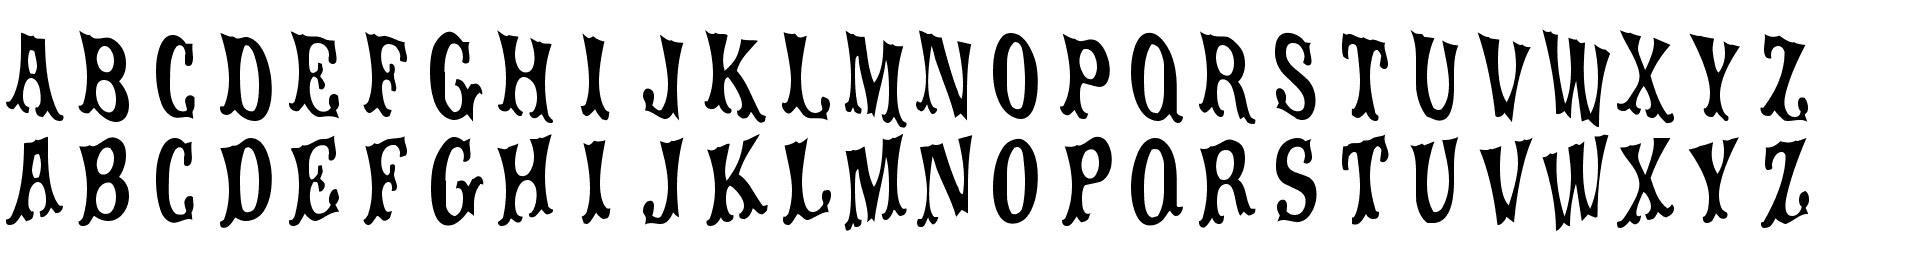 movieola titletype